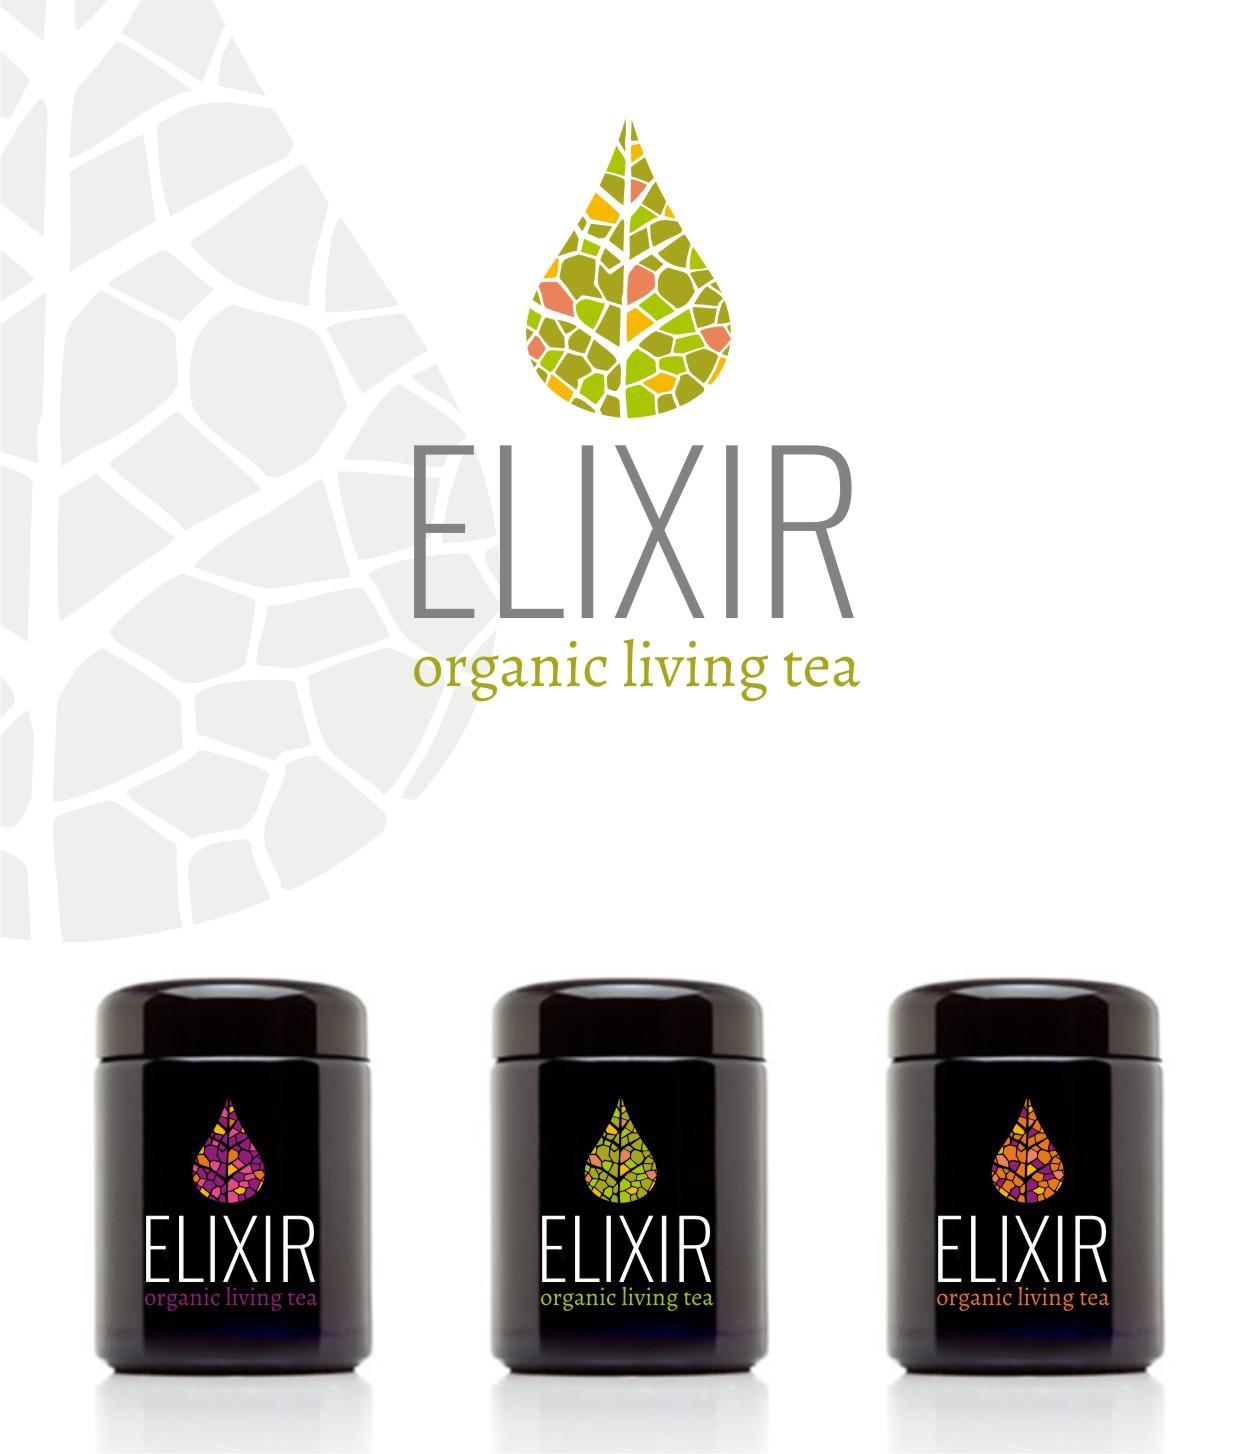 Create a Logo for our Organic Tea as a Medicine brand - Very Clear Brief